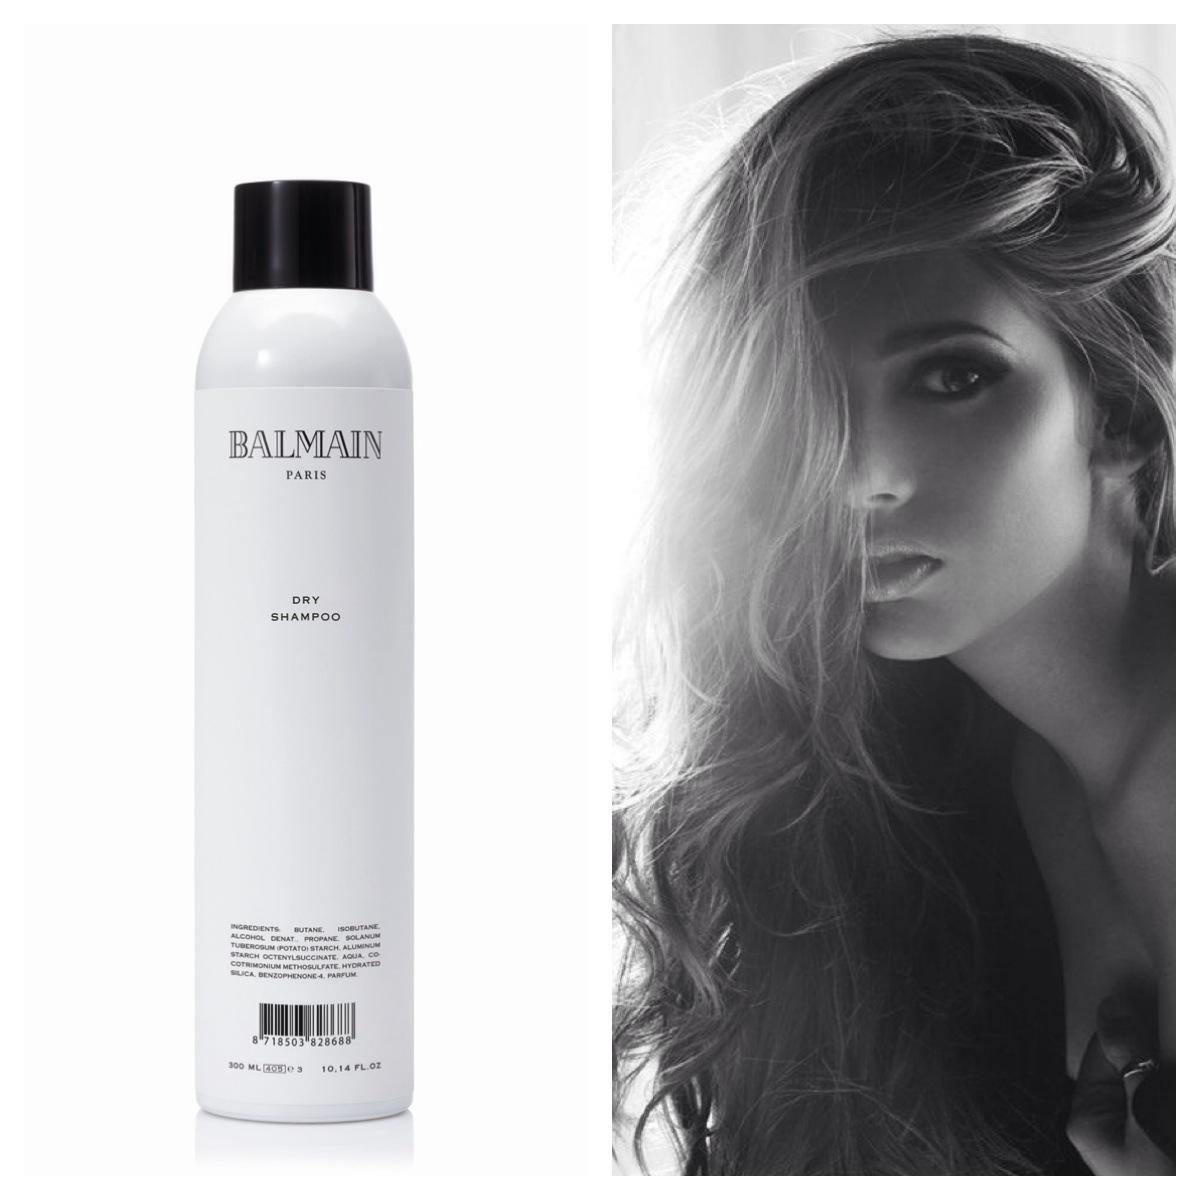 Fact Dry Shampoo Makes Dreams Last Longer Hair Meme Dry Shampoo Hair Humor Hair Quotes